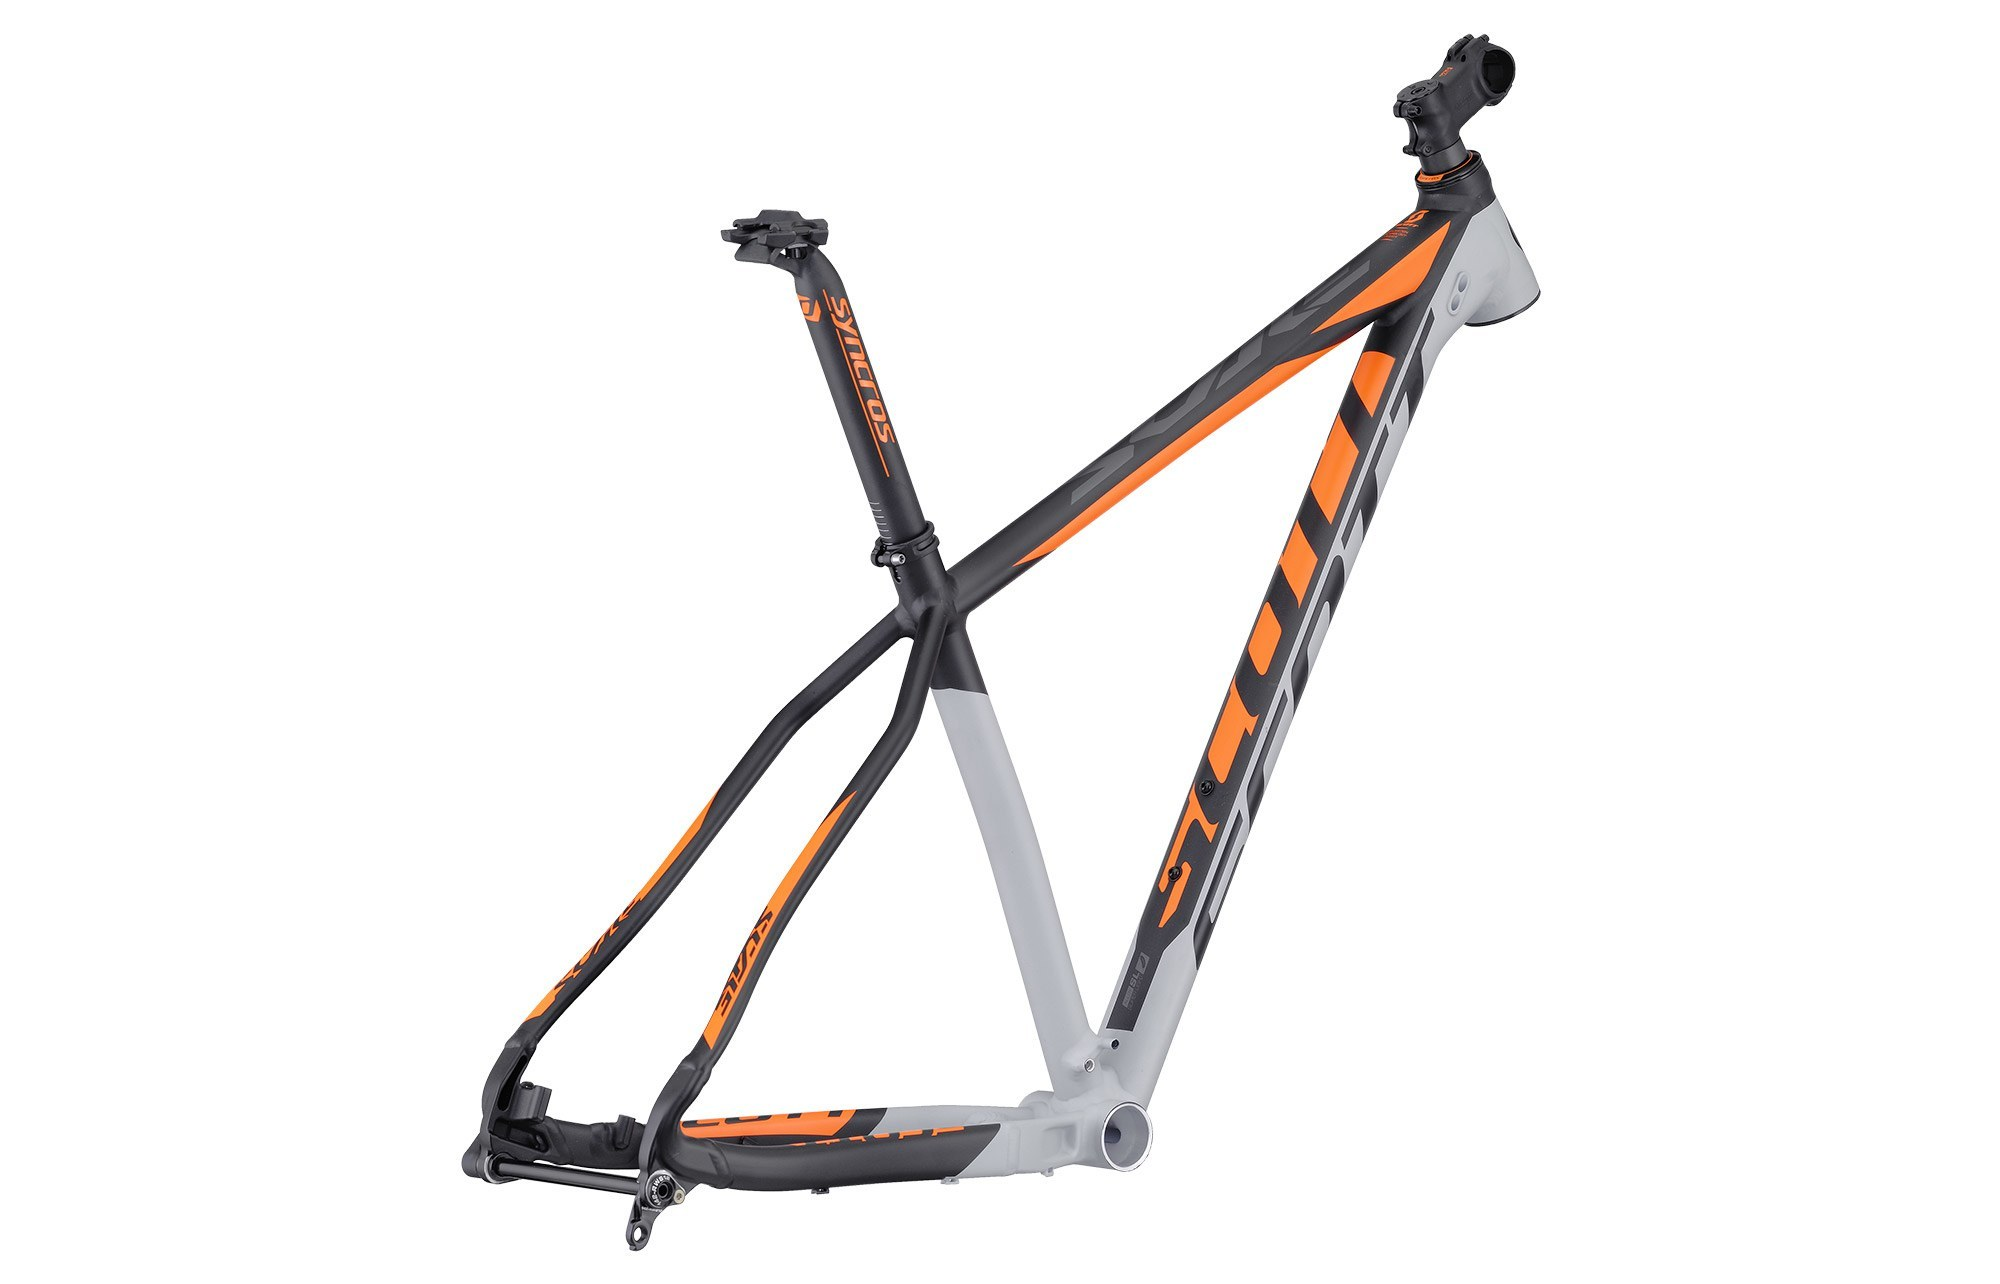 5f2f2b10430 2016 Scott Scale 710 Plus Frame | R&A Cycles